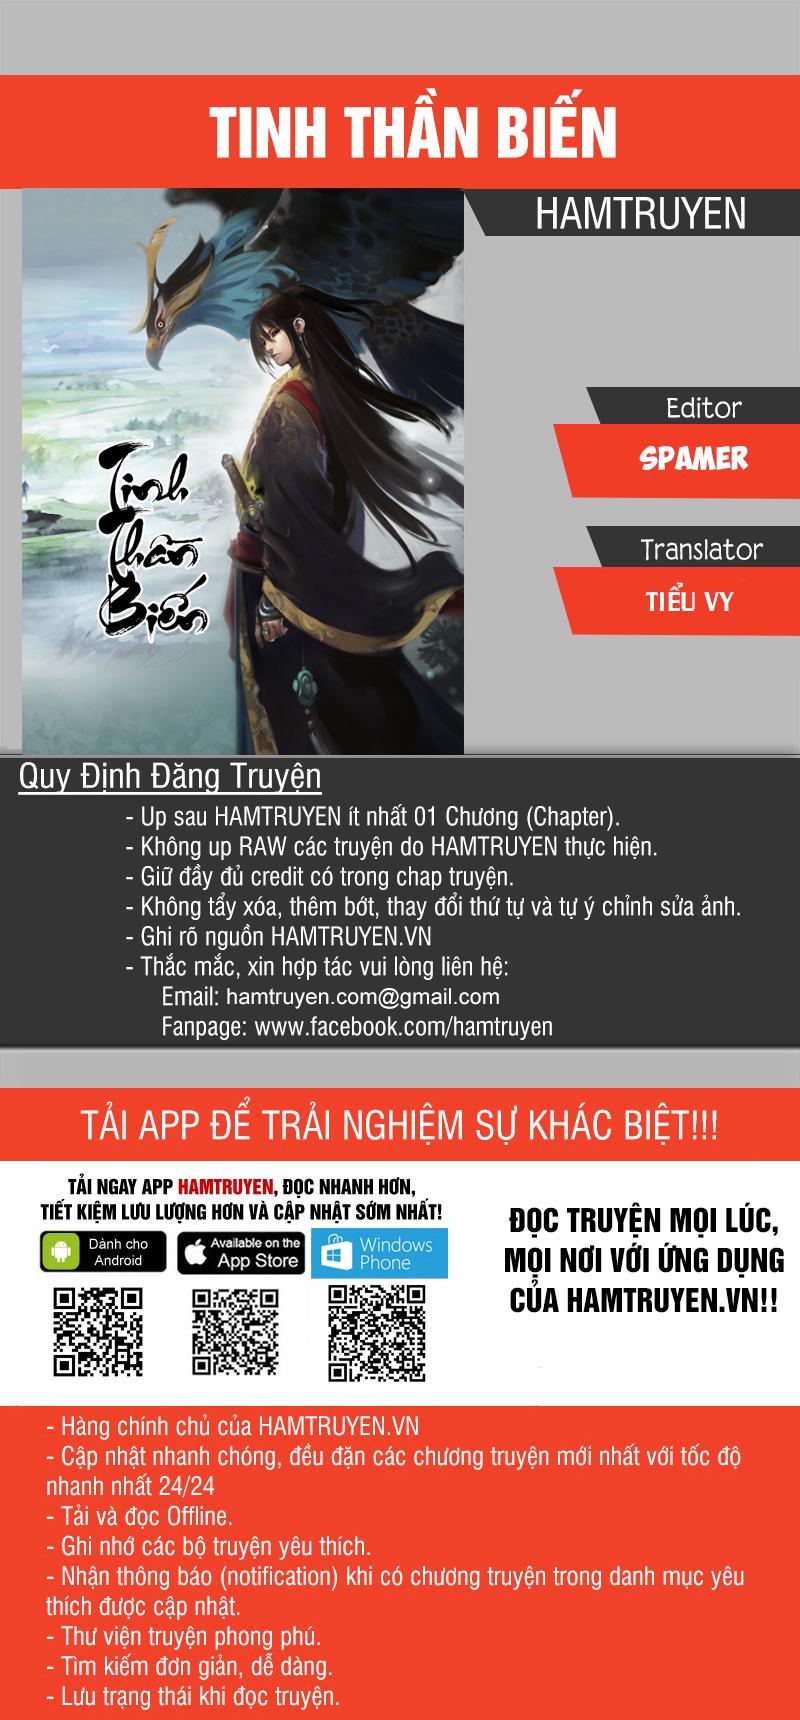 Tinh Thần Biến Chap 489 Upload bởi Truyentranhmoi.net